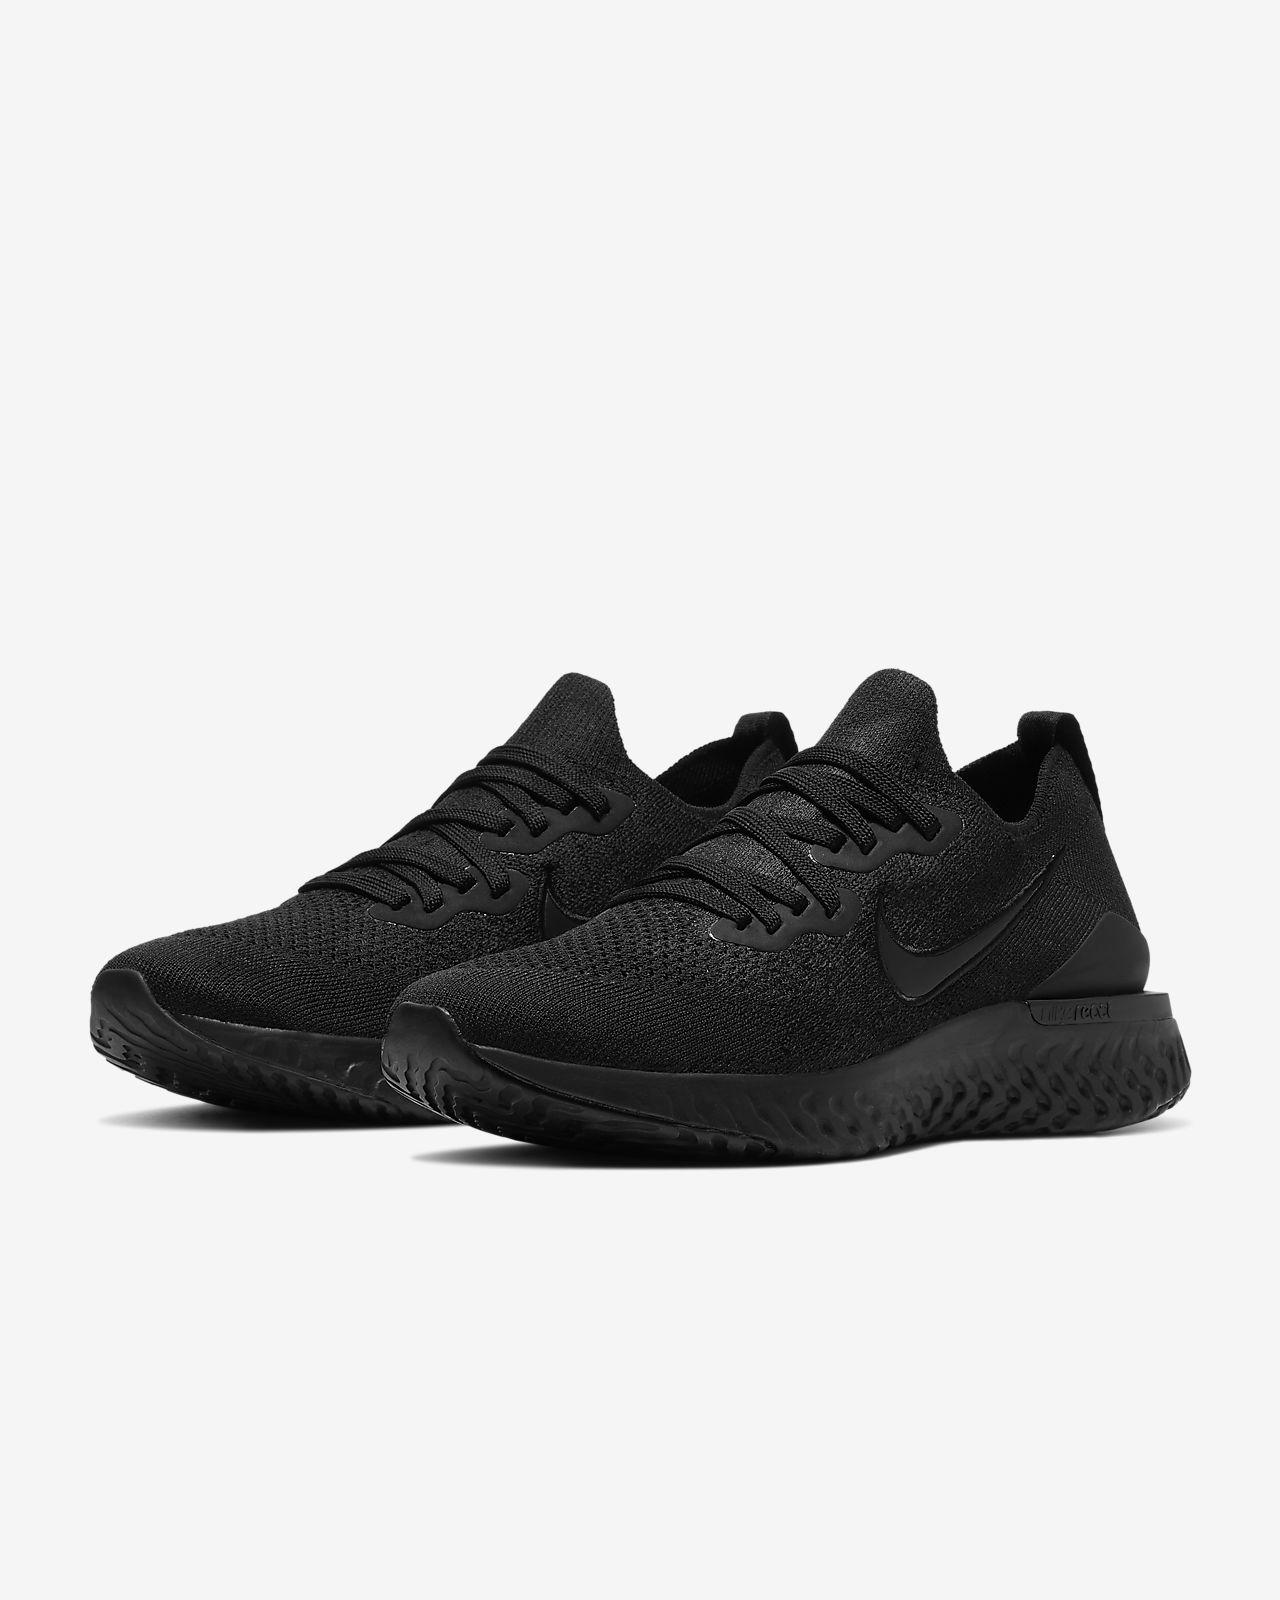 uk availability 7dd81 64780 ... Nike Epic React Flyknit 2 Women s Running Shoe